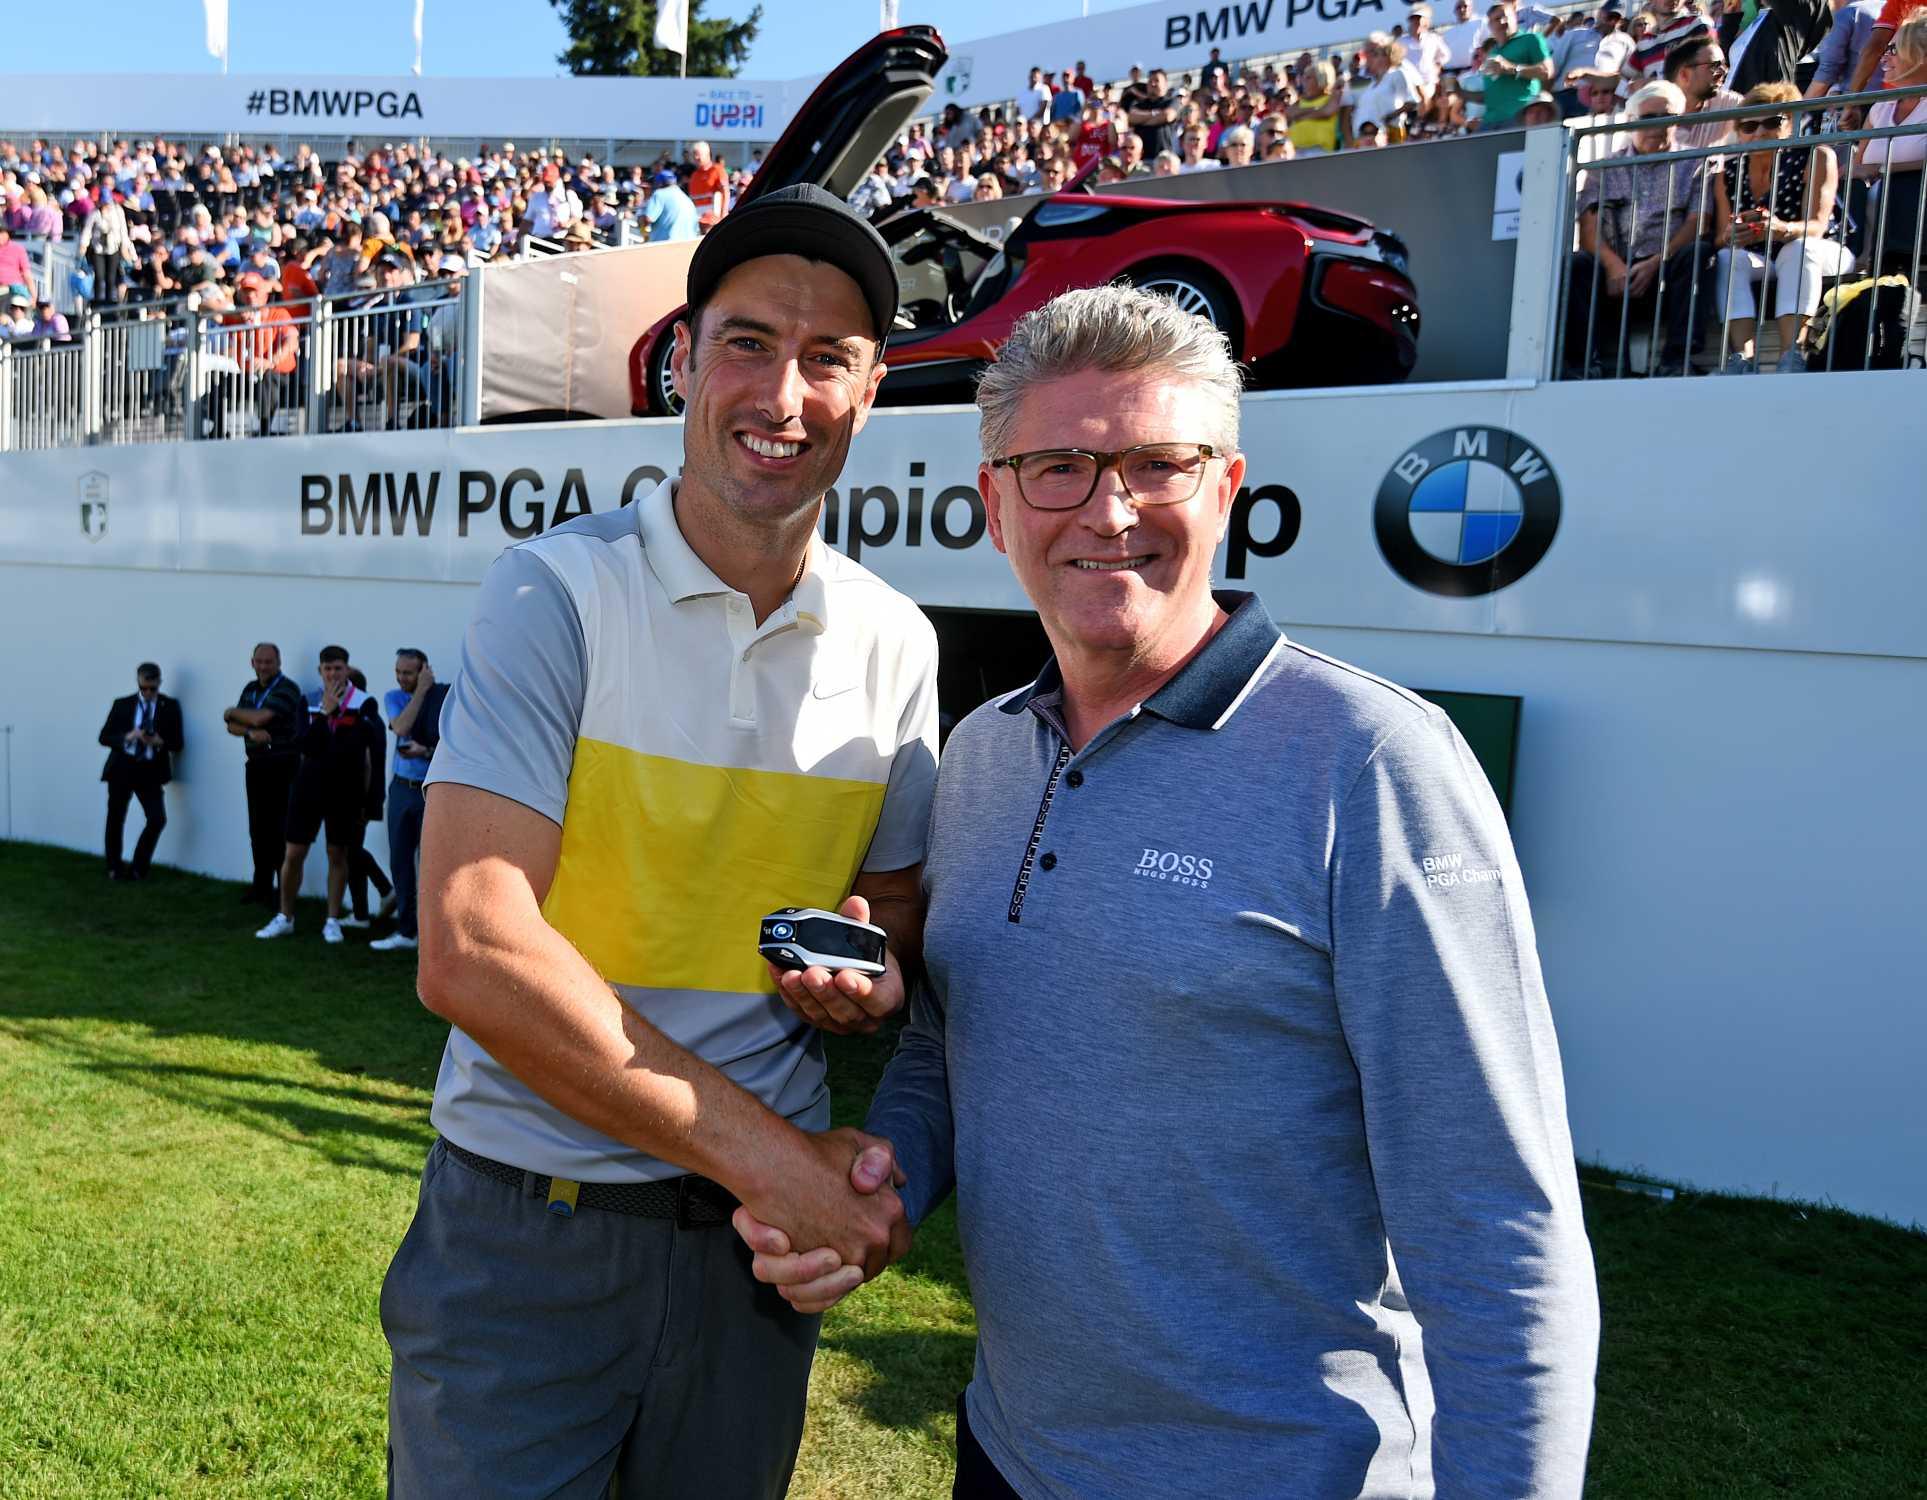 Bmw Pga Championship Ross Fisher Wins Albatross Award Englishman Receives Bmw I8 Roadster For Dream Shot